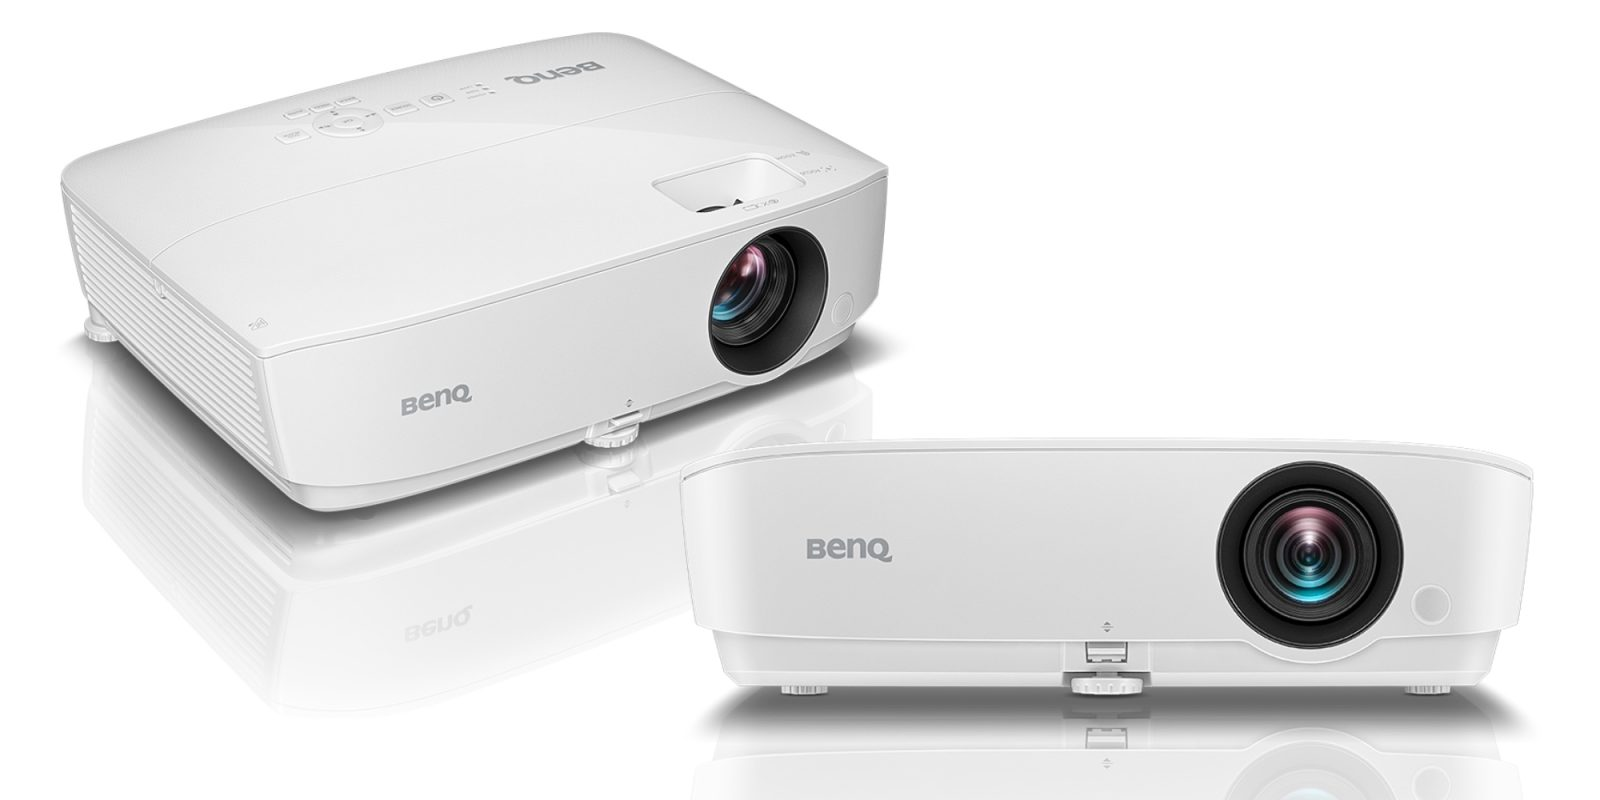 BenQ's 3300-Lumen 1080p DLP Projector returns to Amazon low: $395.50 (20% off)